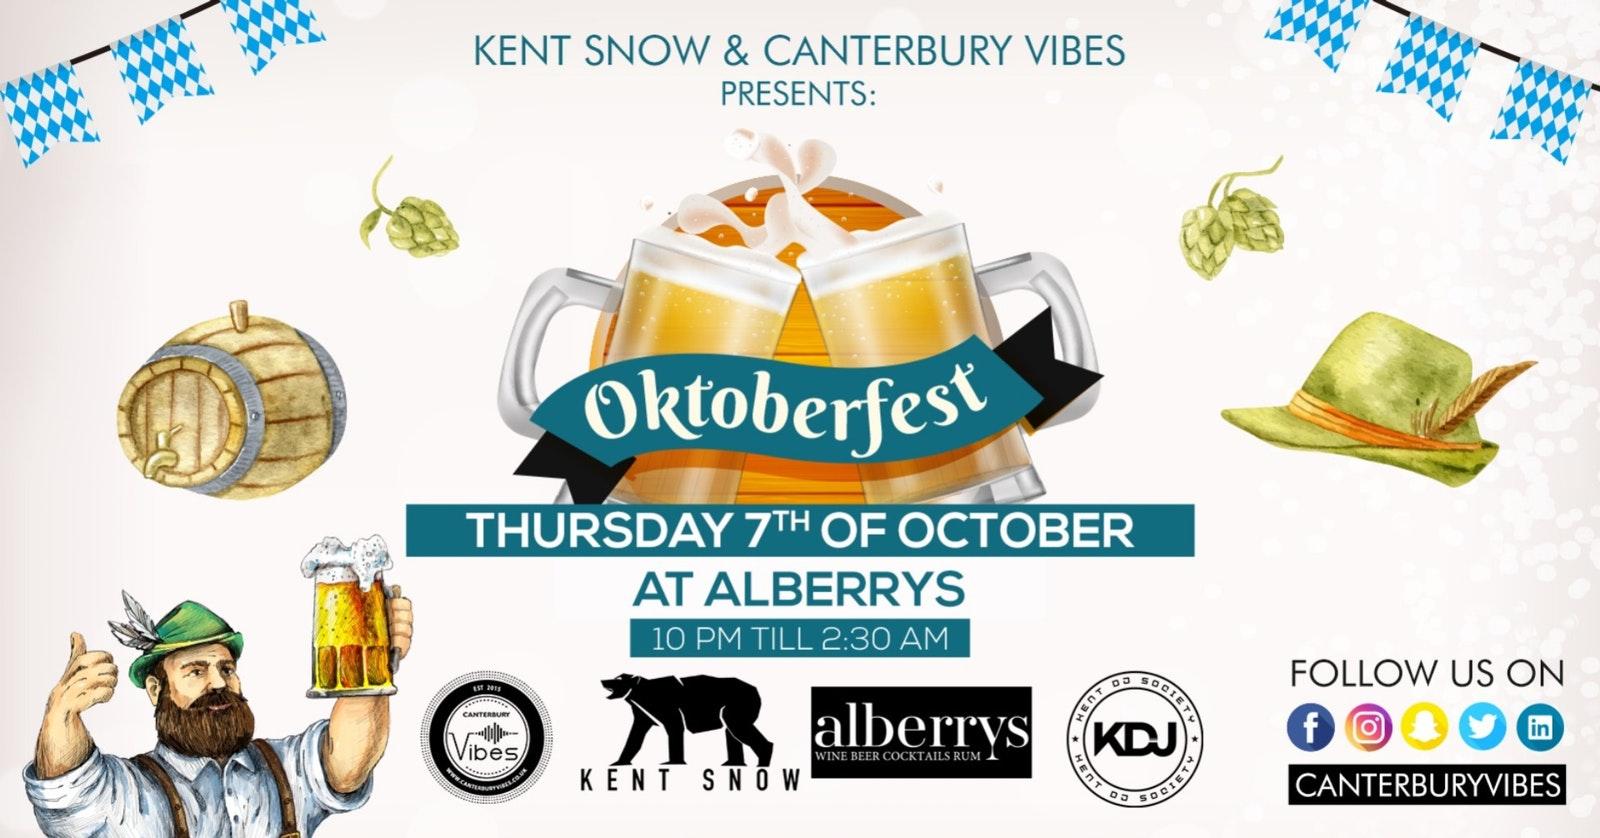 Oktoberfest Canterbury